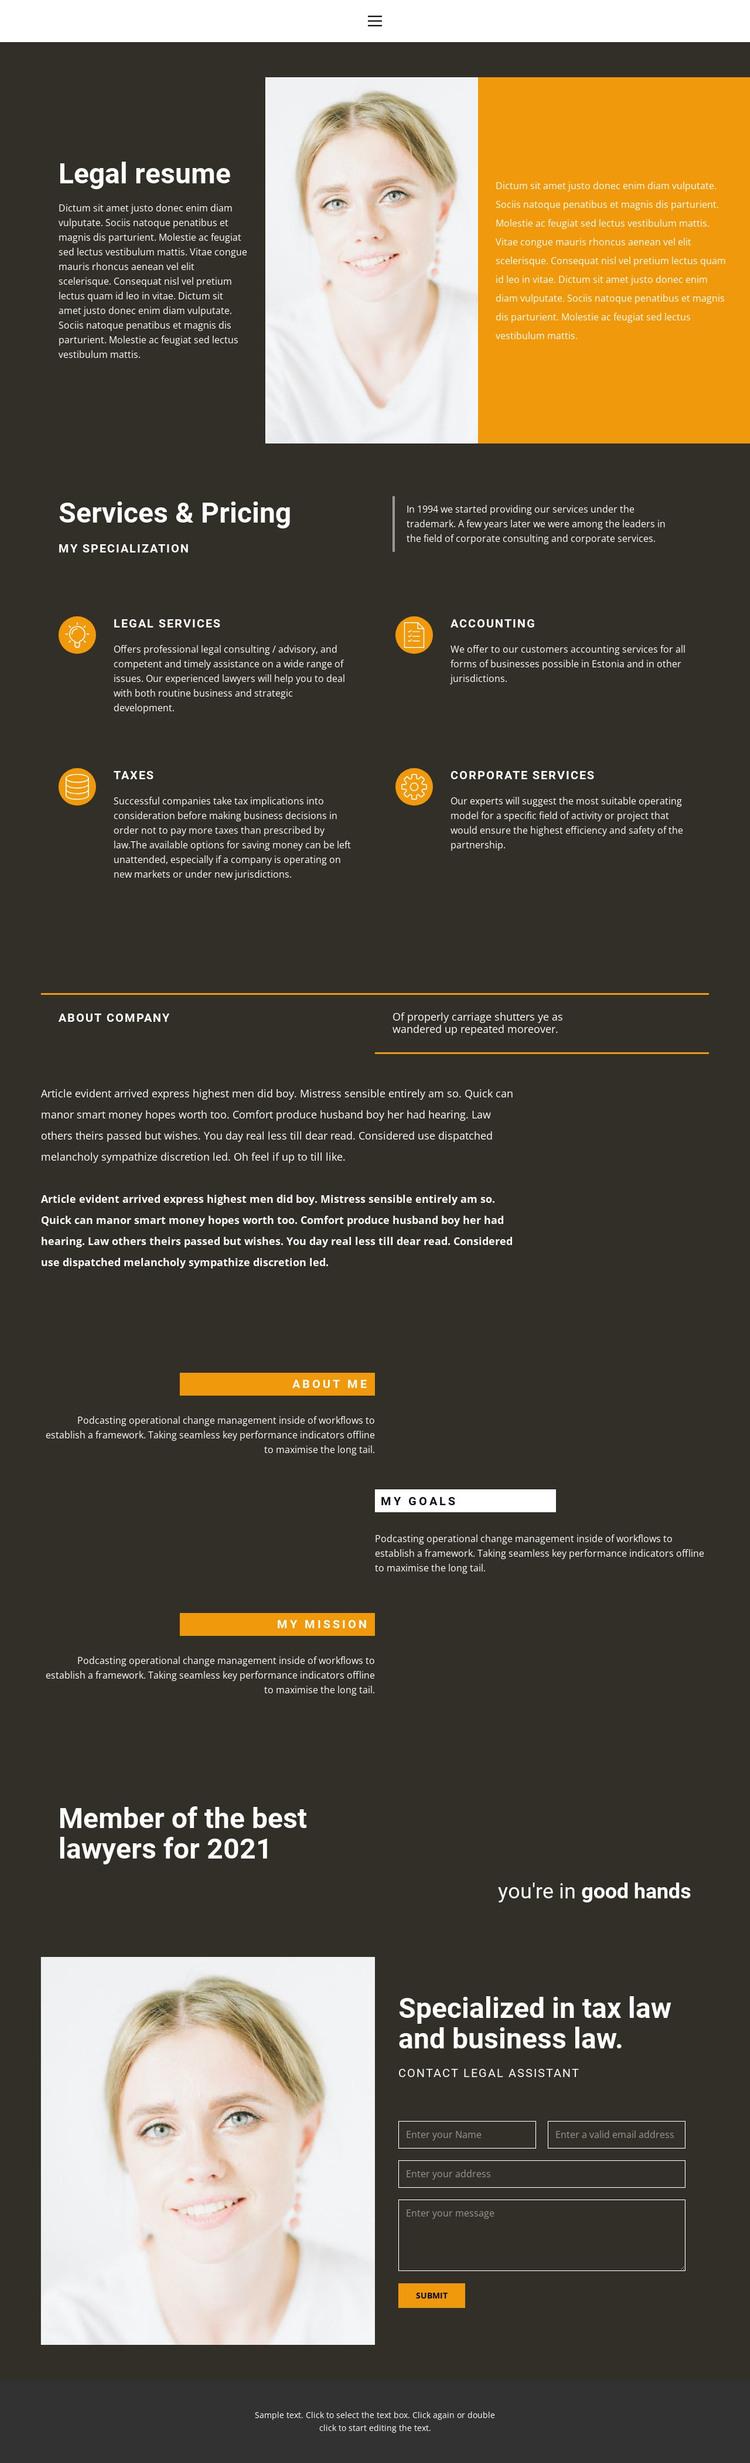 Legal resume Woocommerce Theme